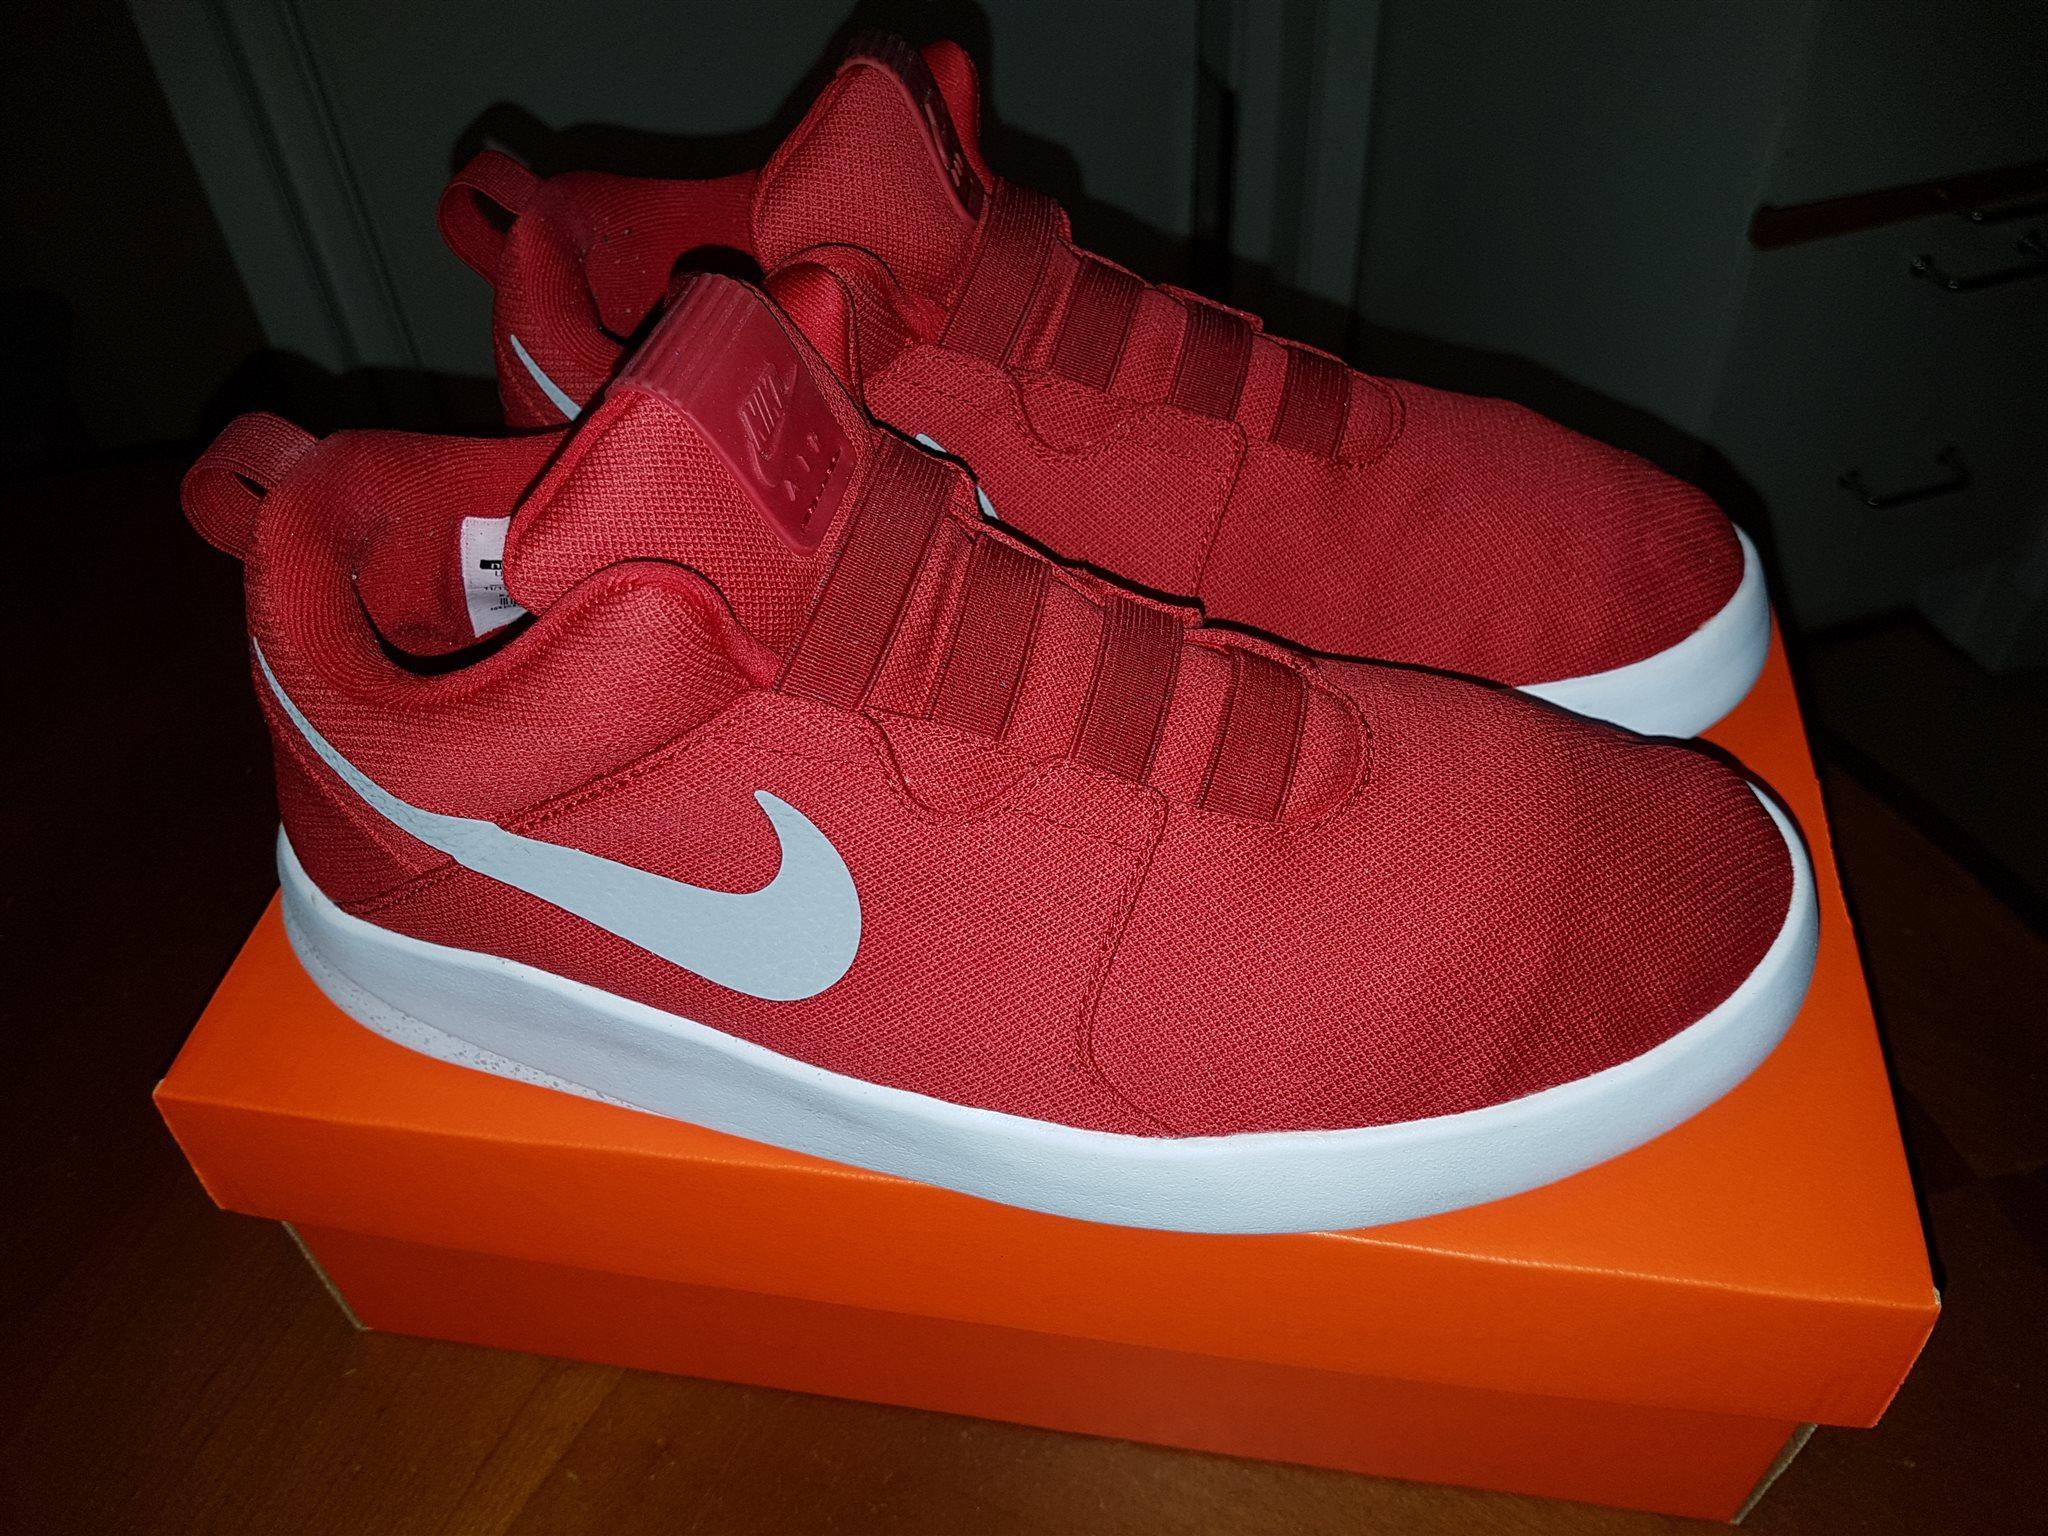 on sale e7e6d cf2dc Nike Nike Skor Storlek 314414788 314414788 Skor Nike Storlek 44 44 7R4q7Owxr